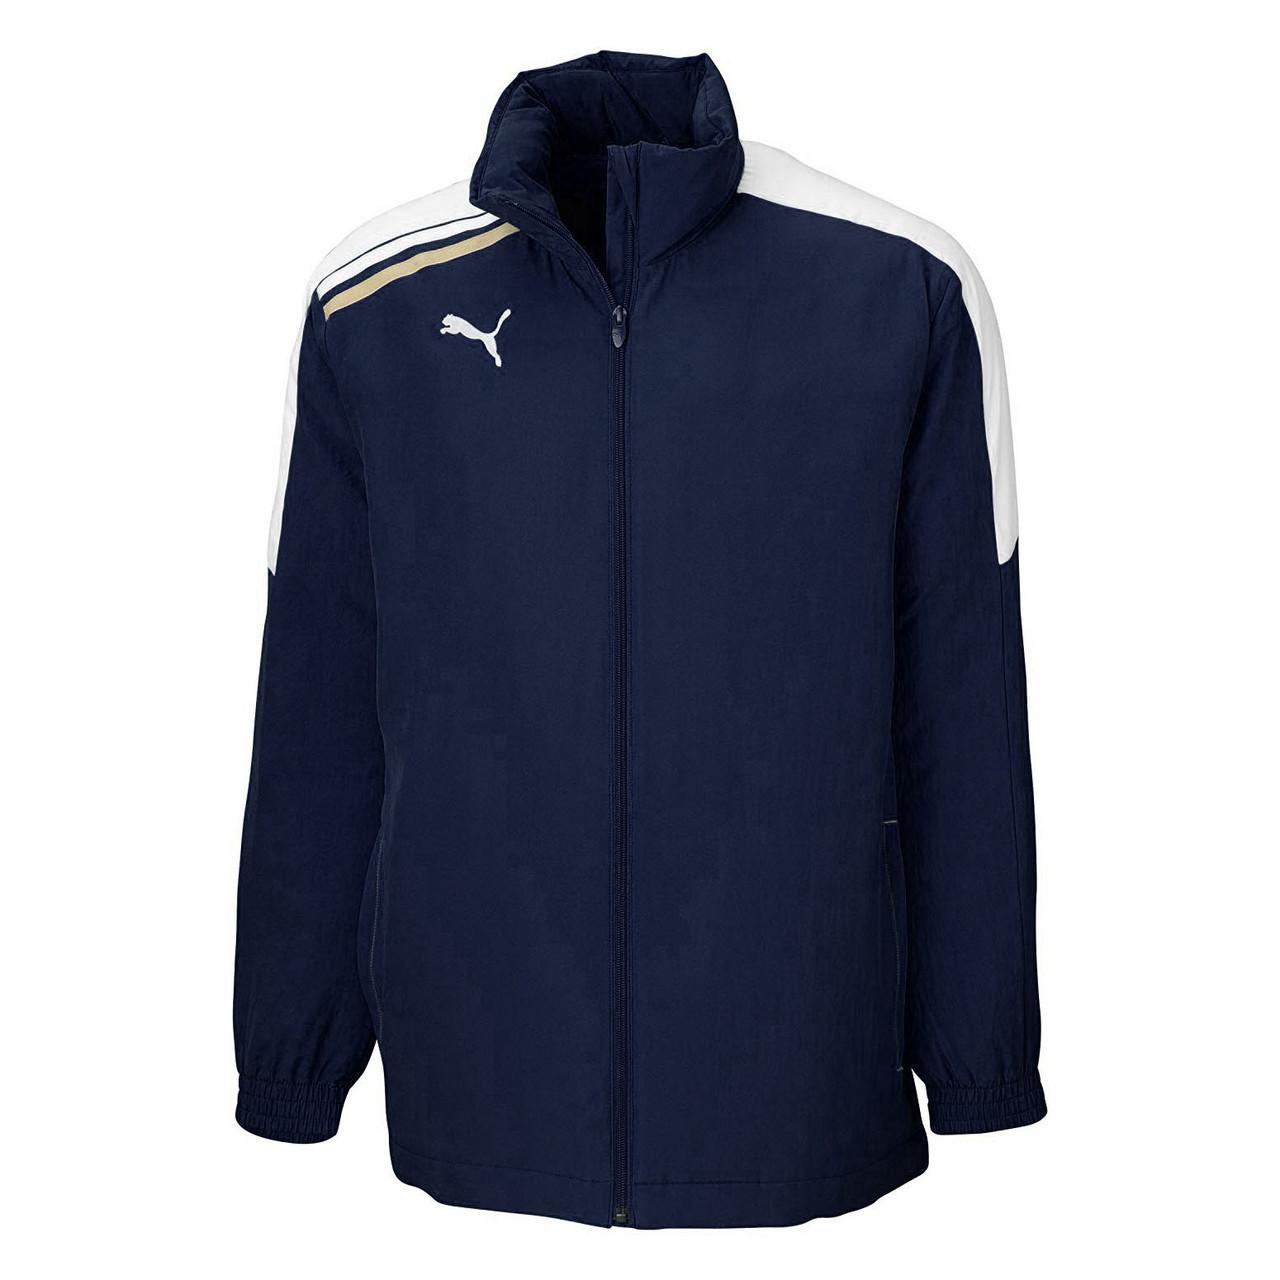 Куртка Puma Esito Stadium Jacket 652602 S Navy